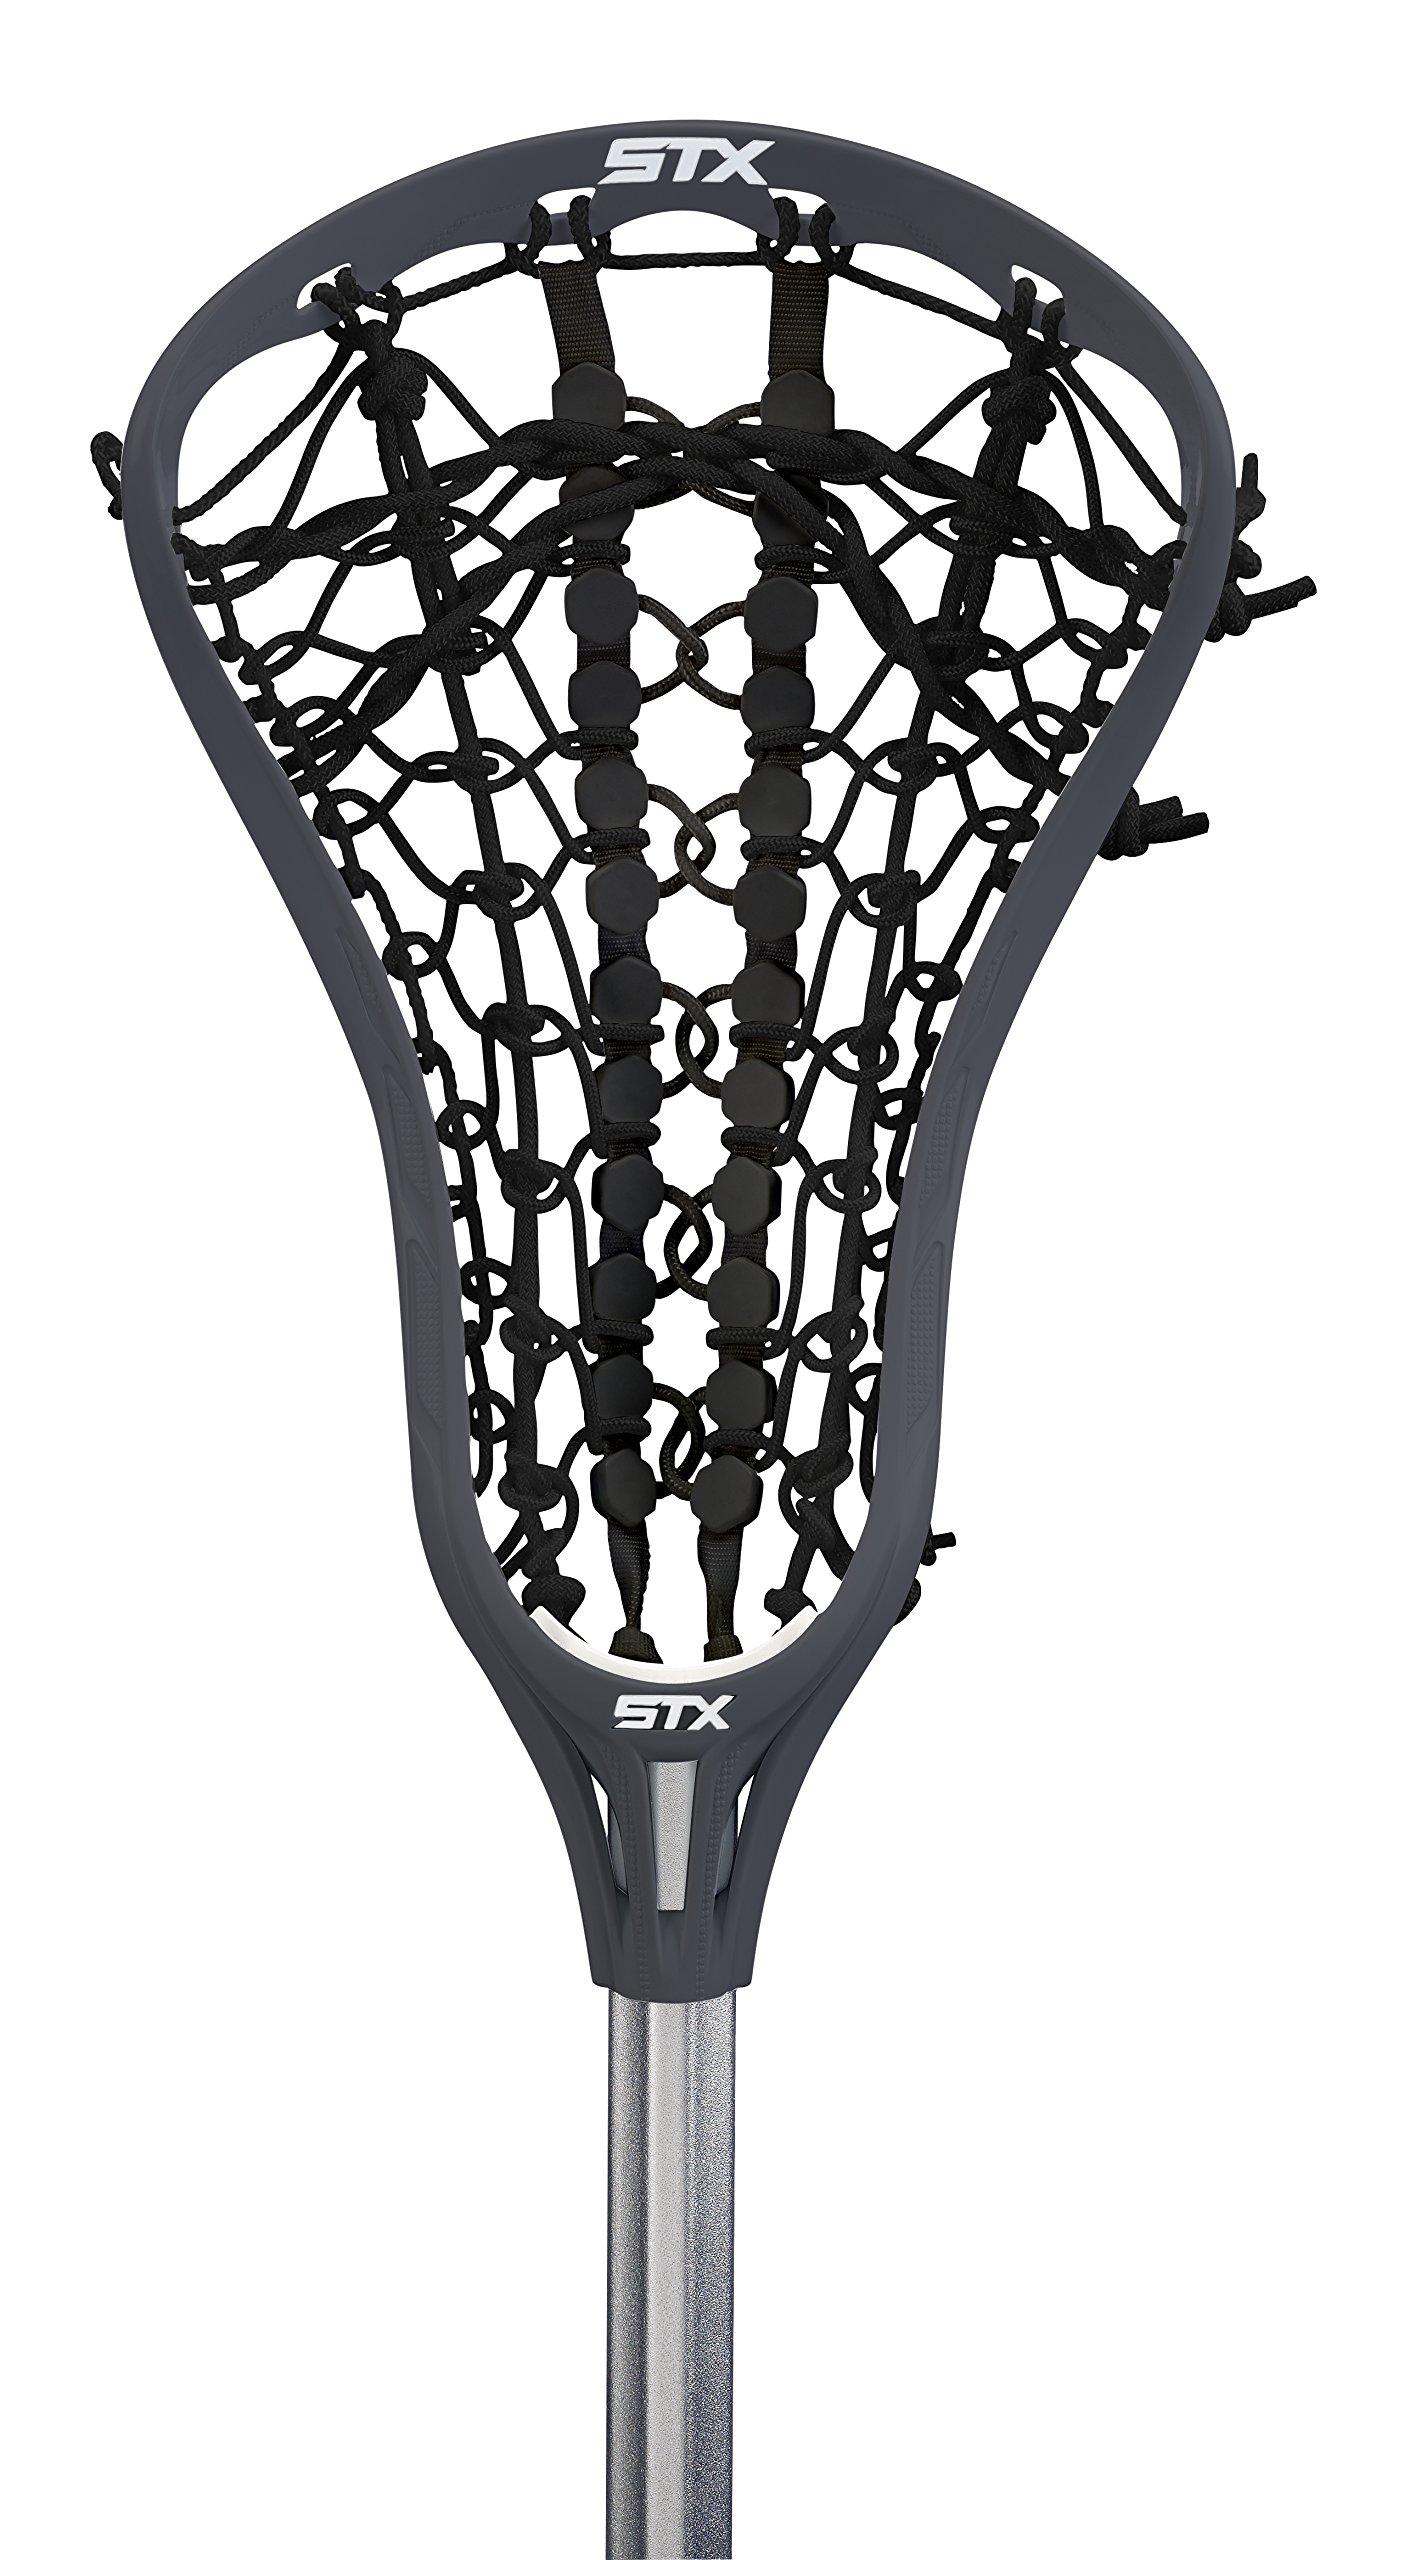 STX Lacrosse Women's EXULT 300 Complete Stick Graphite Gray Head and Black Runway Pocket on 7075 Handle